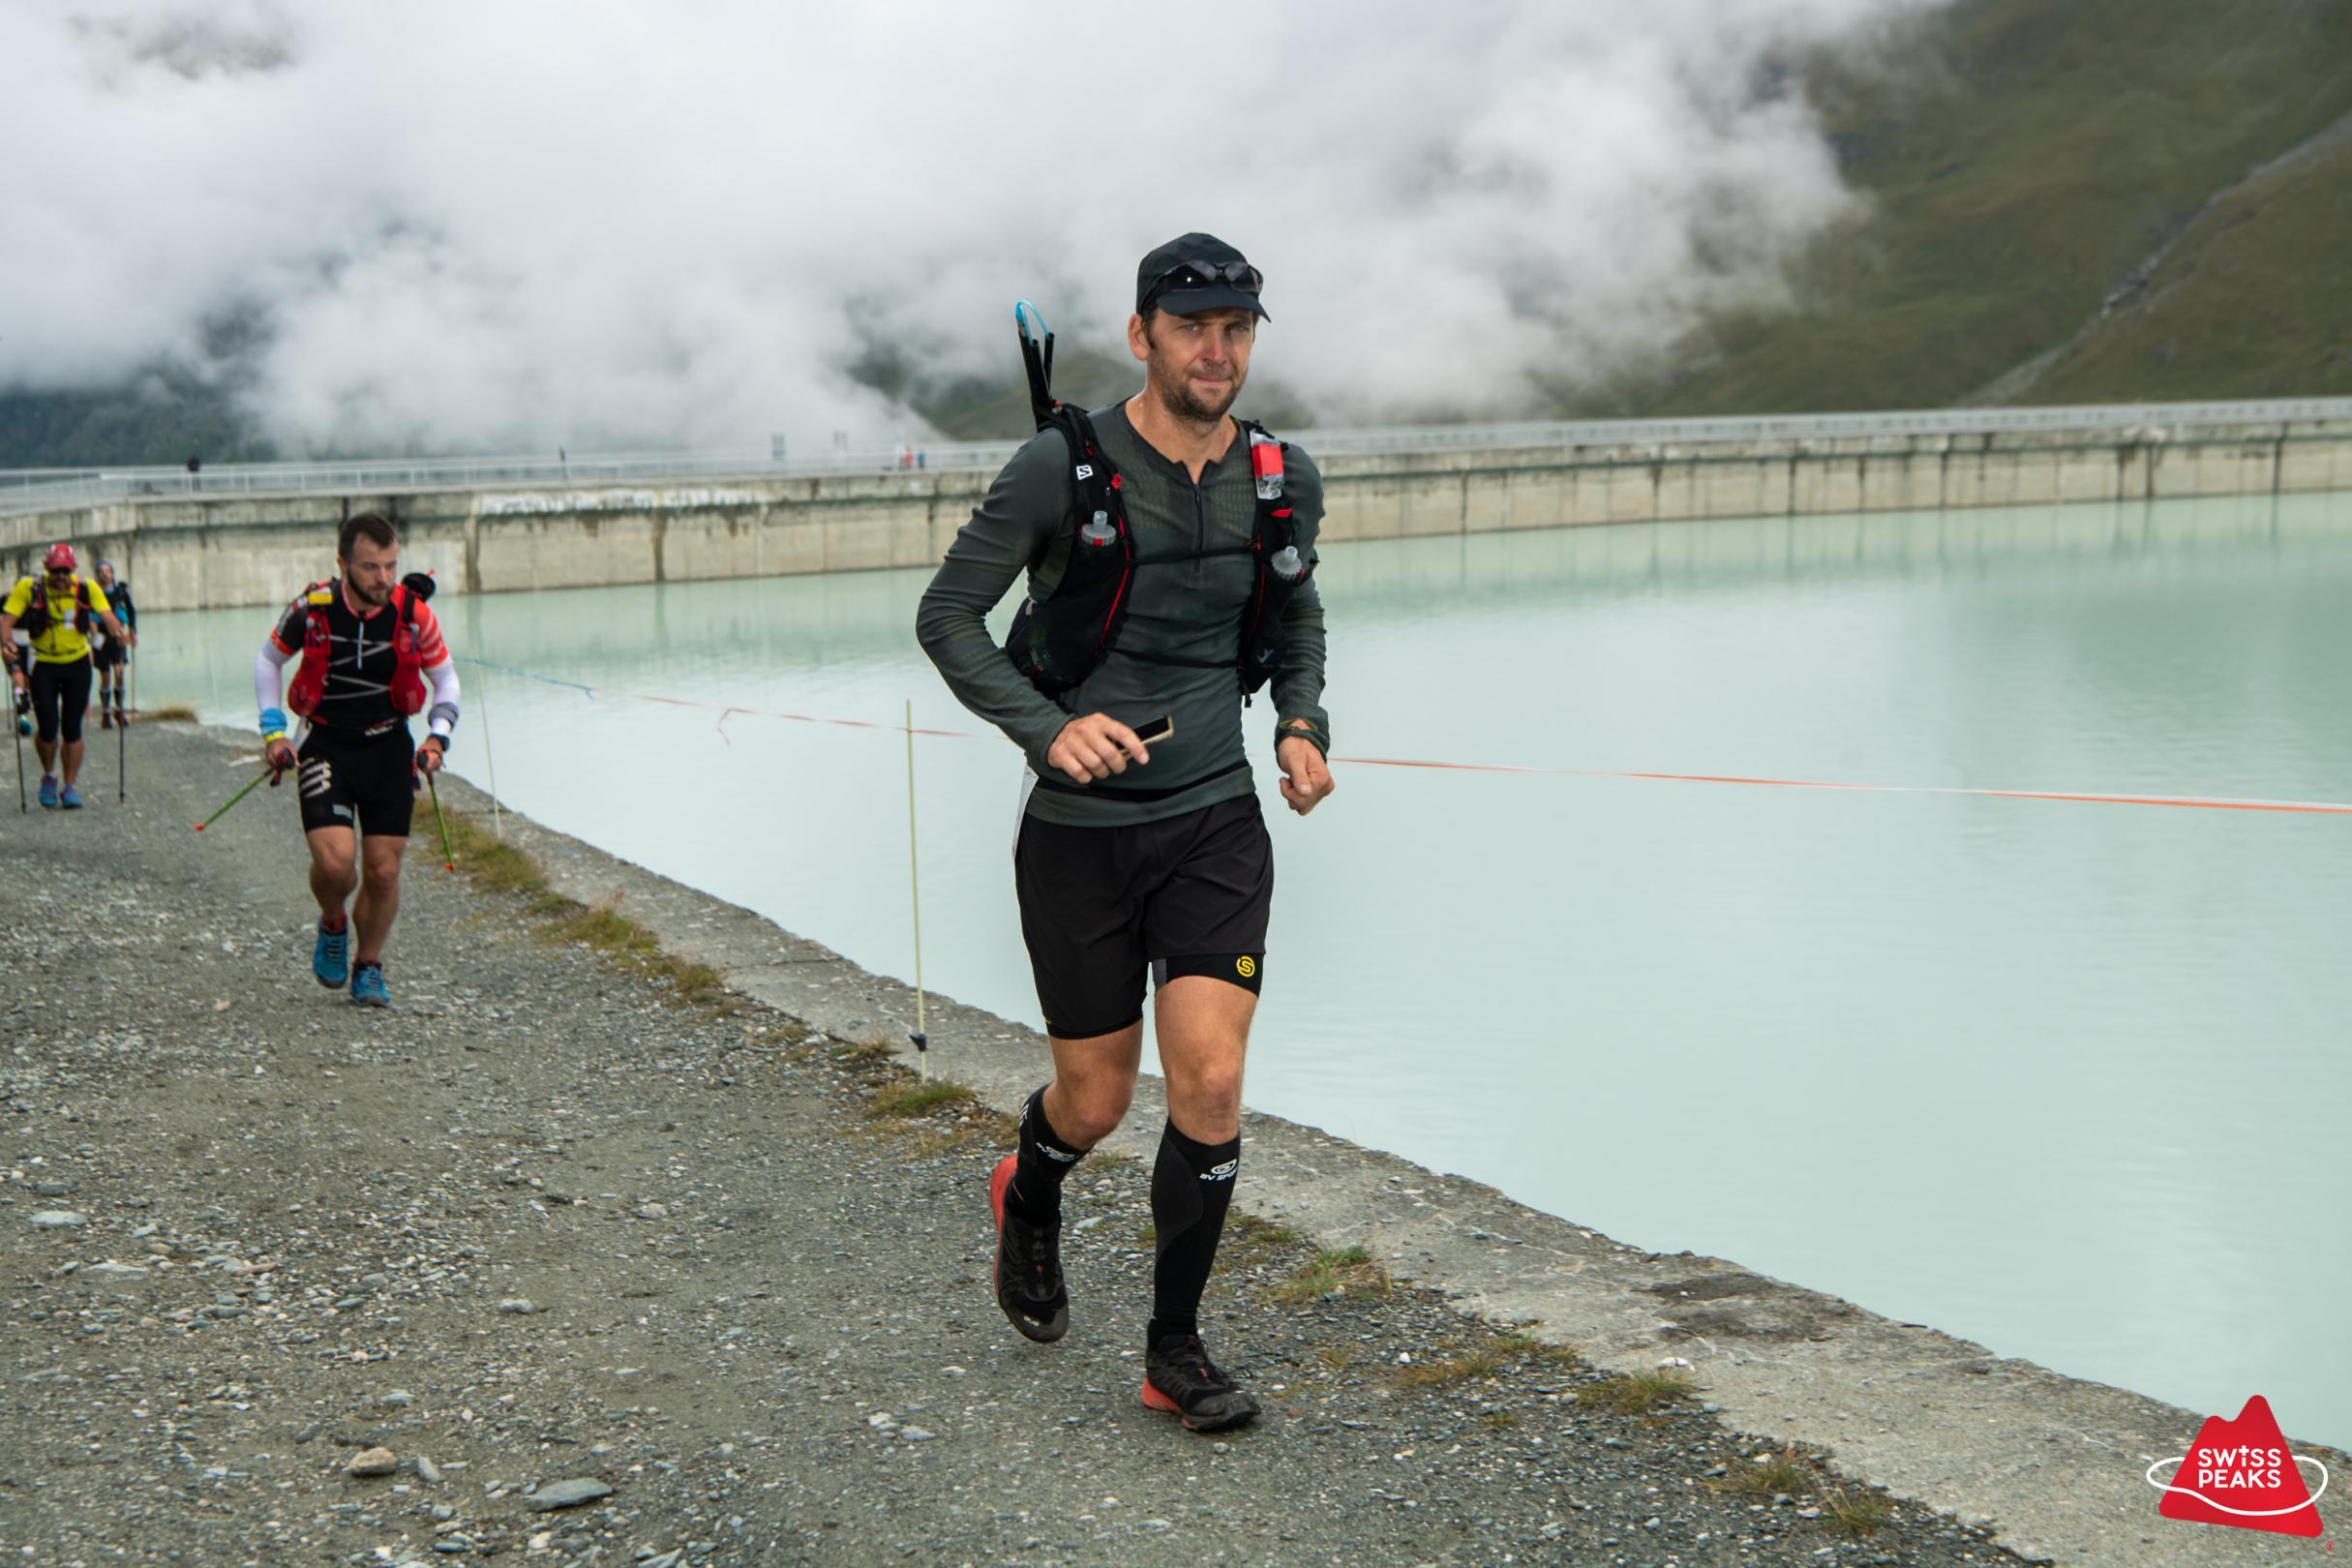 SwissPeaks Trail_Coureur devant Barrage.jpg